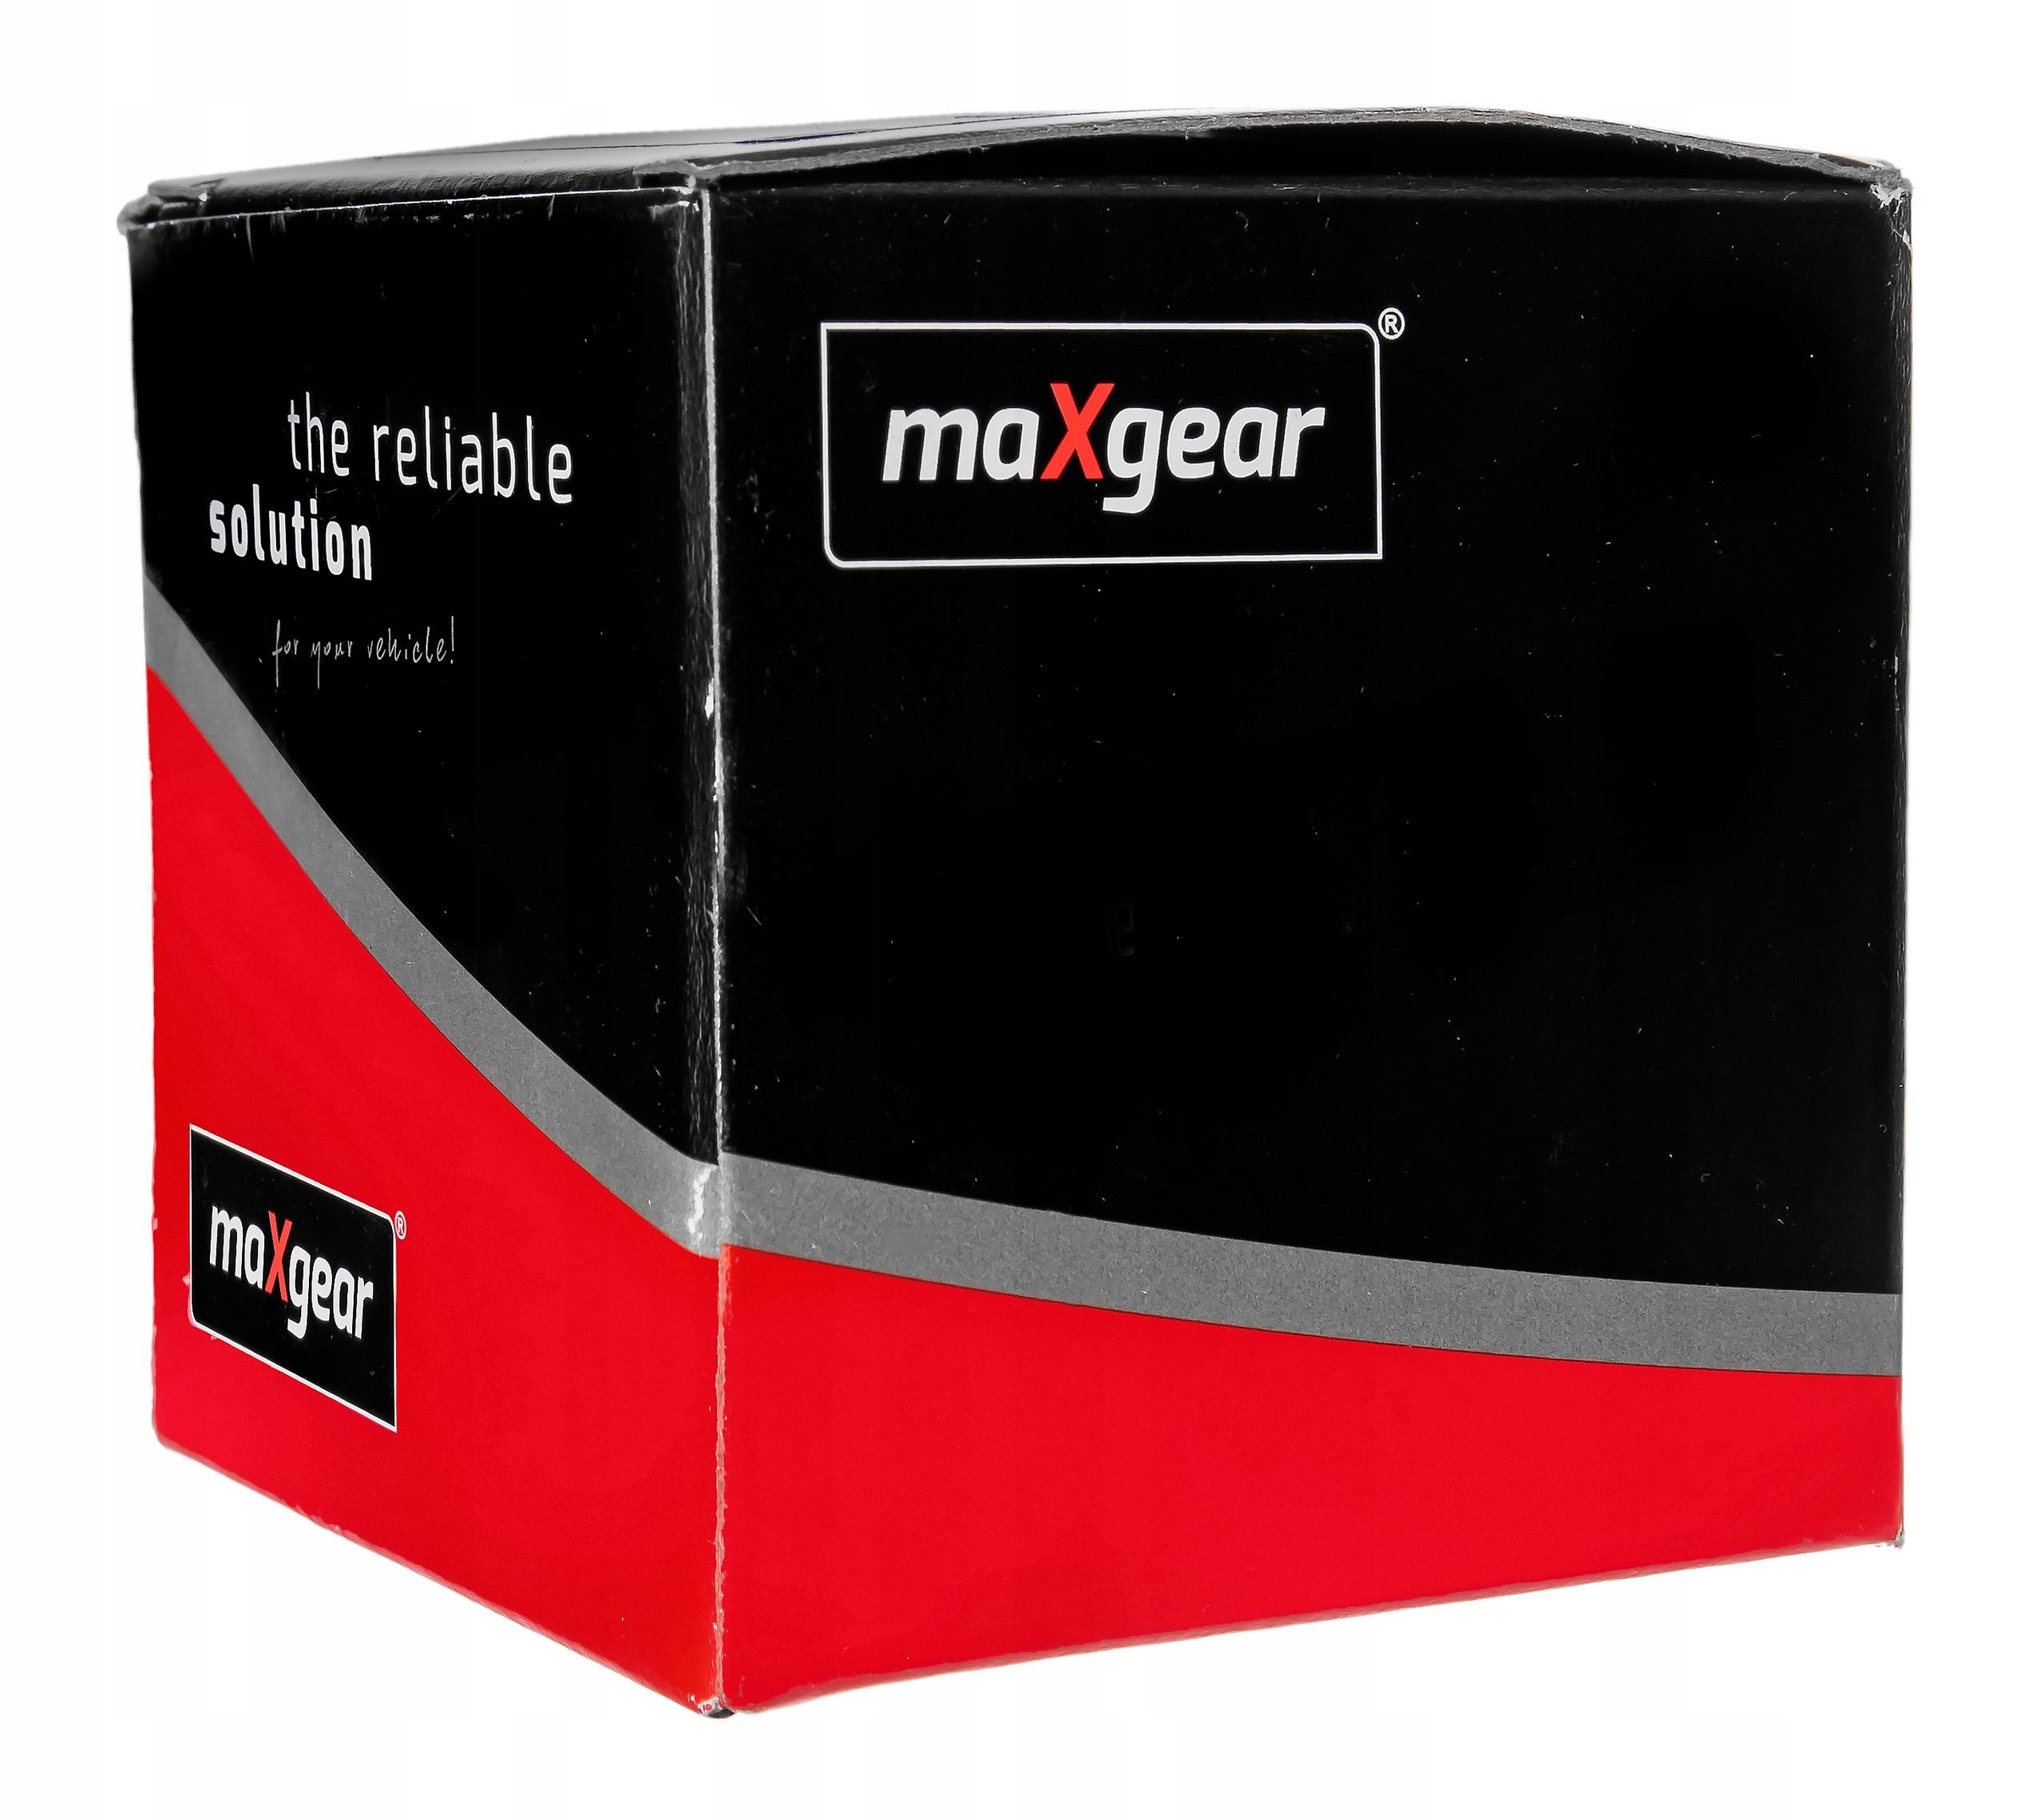 maxgear ac145238 катушка сцепления компрессора климат